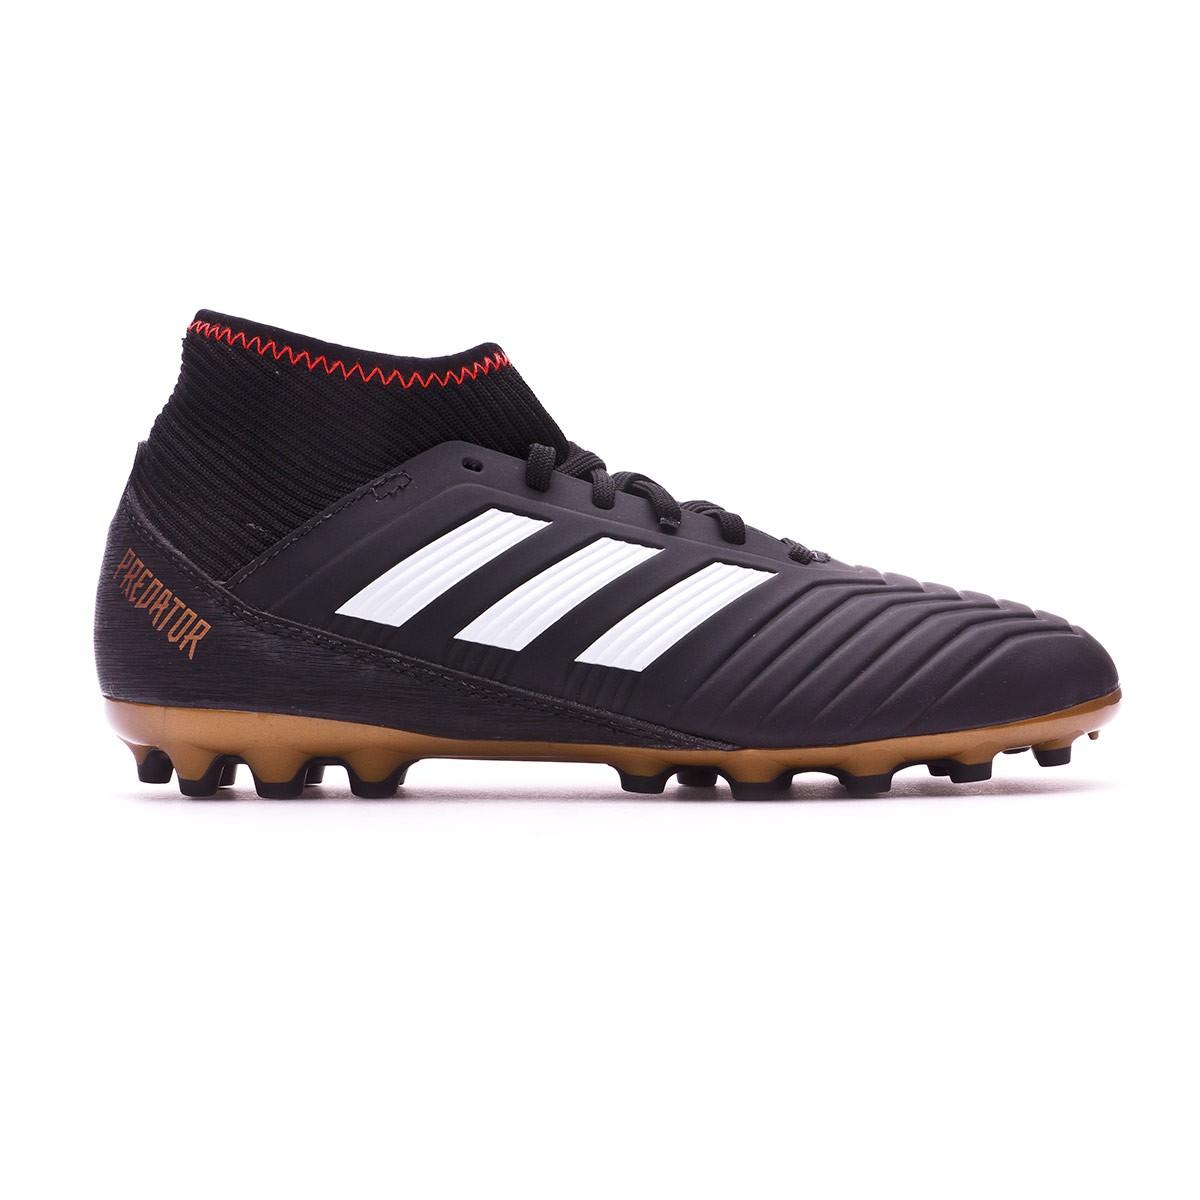 91a8db80e966 Football Boots adidas Kids Predator 18.3 AG Core black-White-Gold  metallic-Solar red - Tienda de fútbol Fútbol Emotion